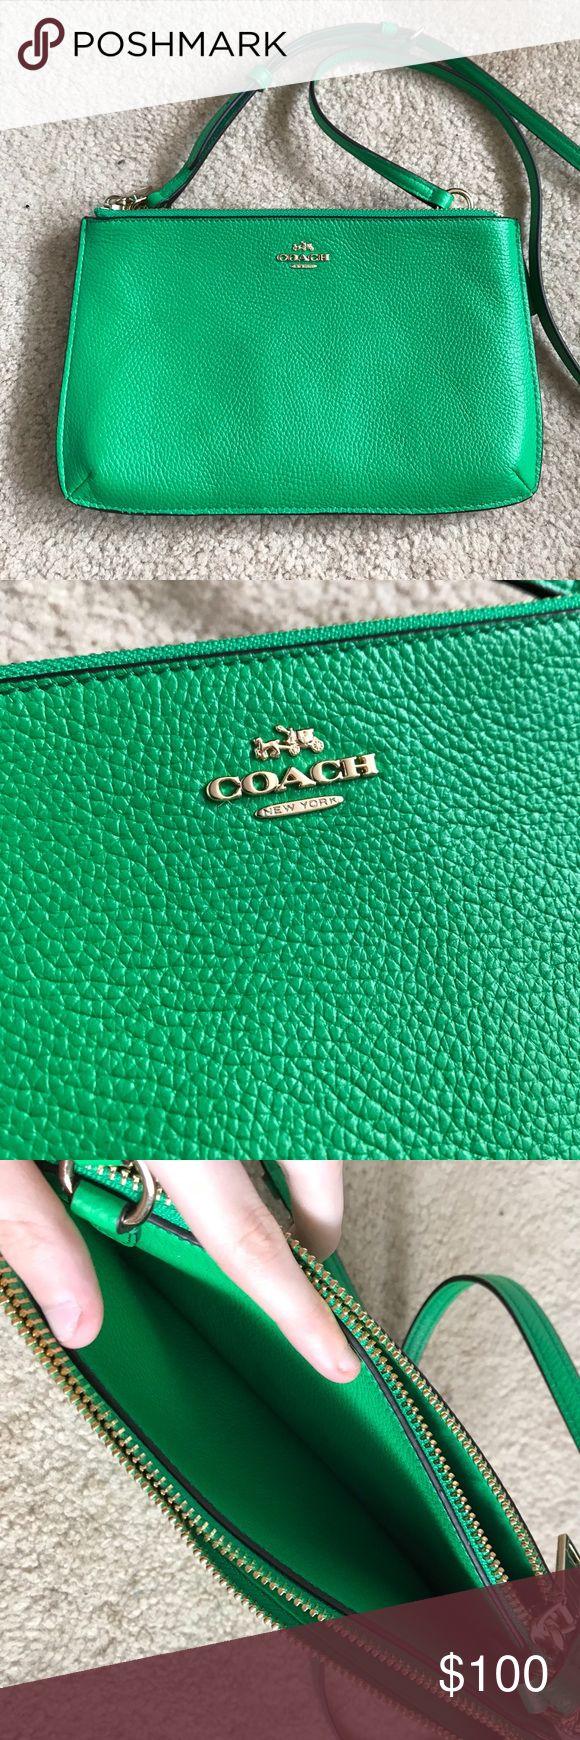 green coach crossbody purse Nwot, never used Coach Bags Crossbody Bags